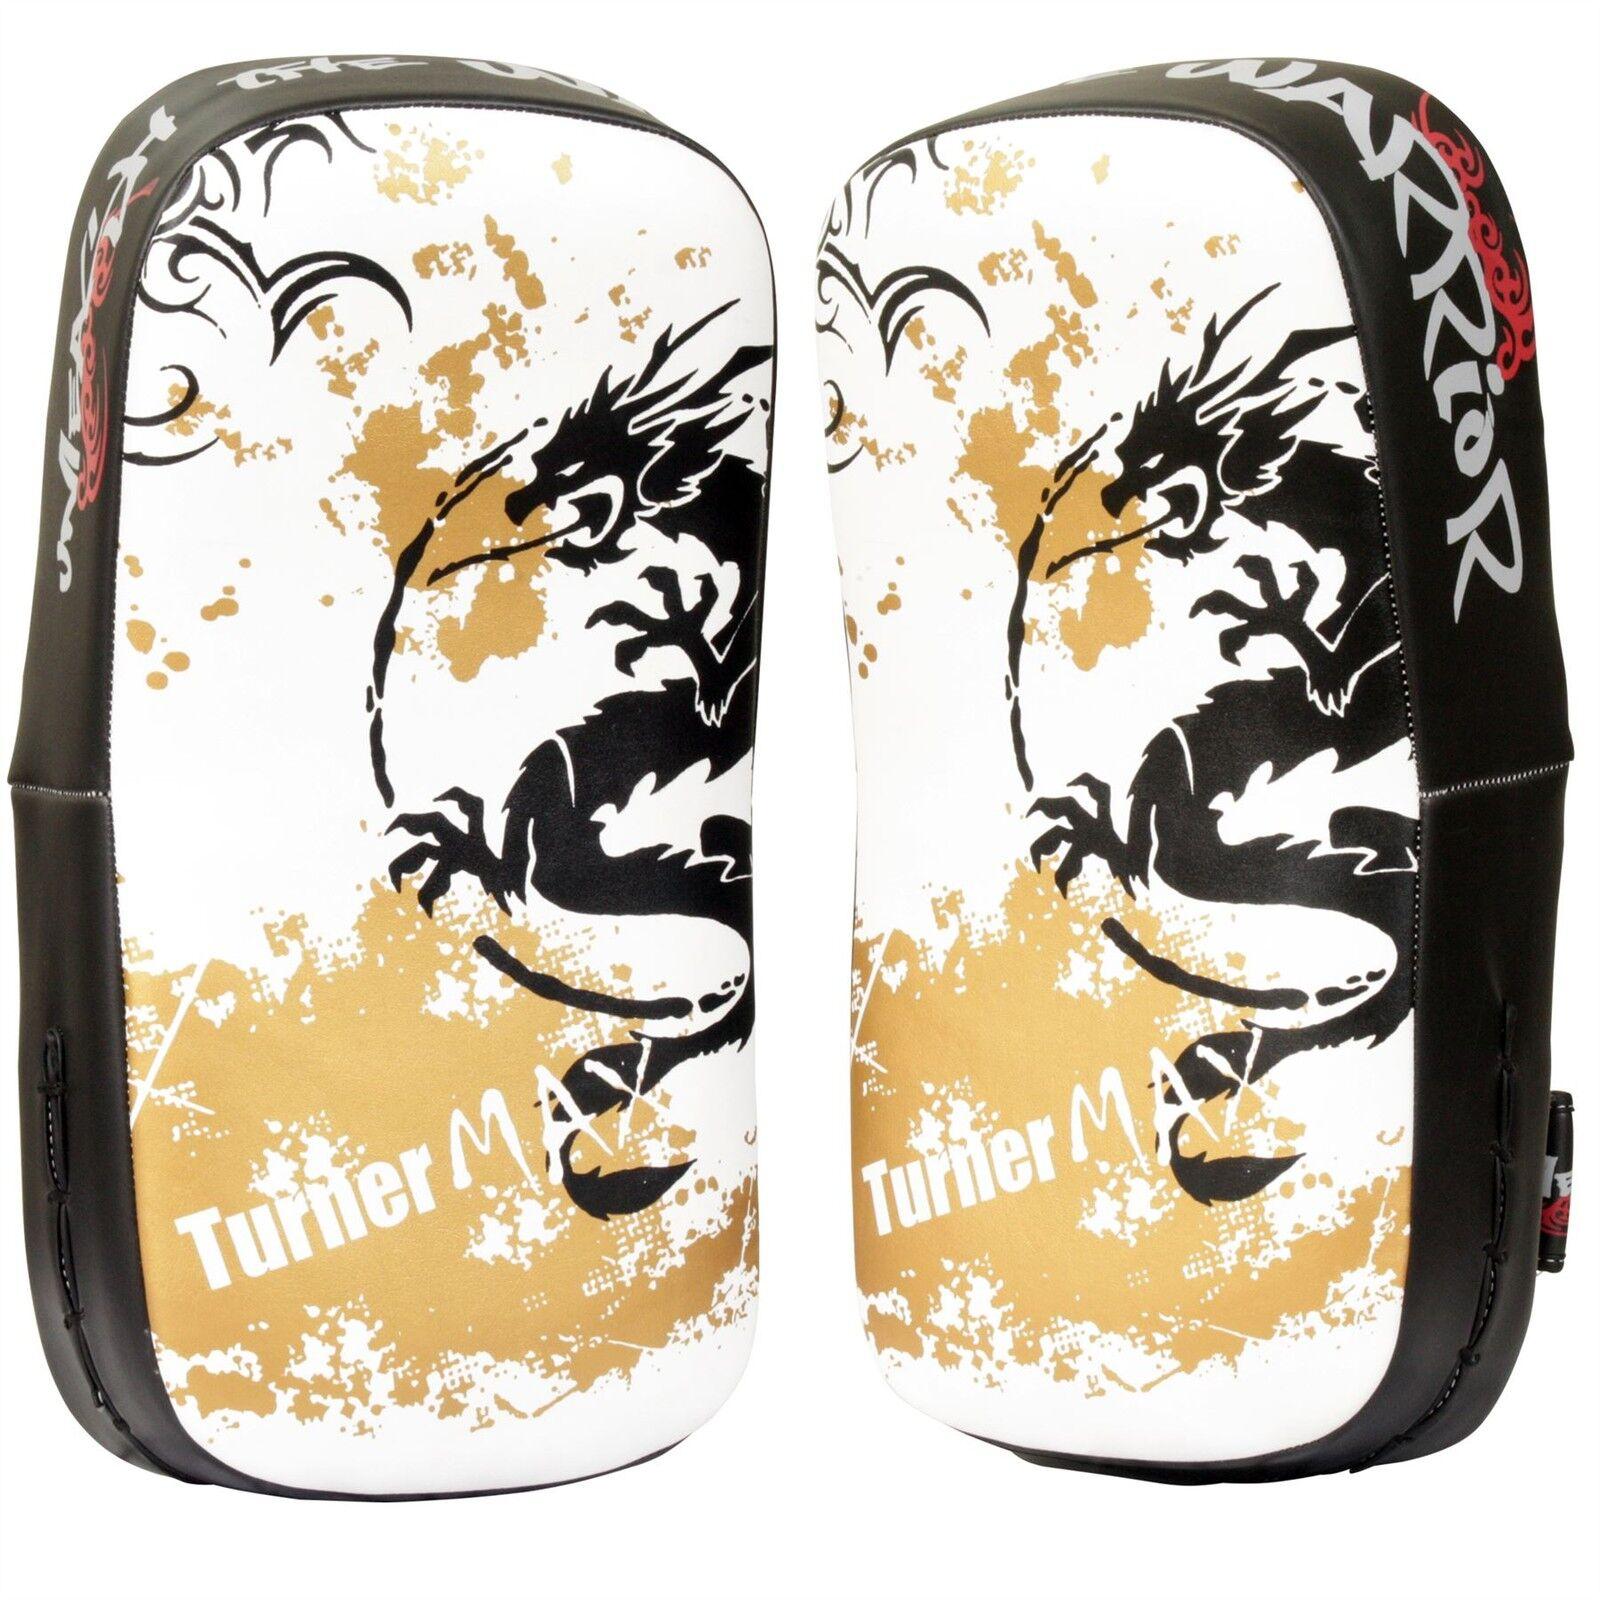 TurnerMAX Muay Thai Pads Training Kick Boxing MMA Martial Arts Punching Shield